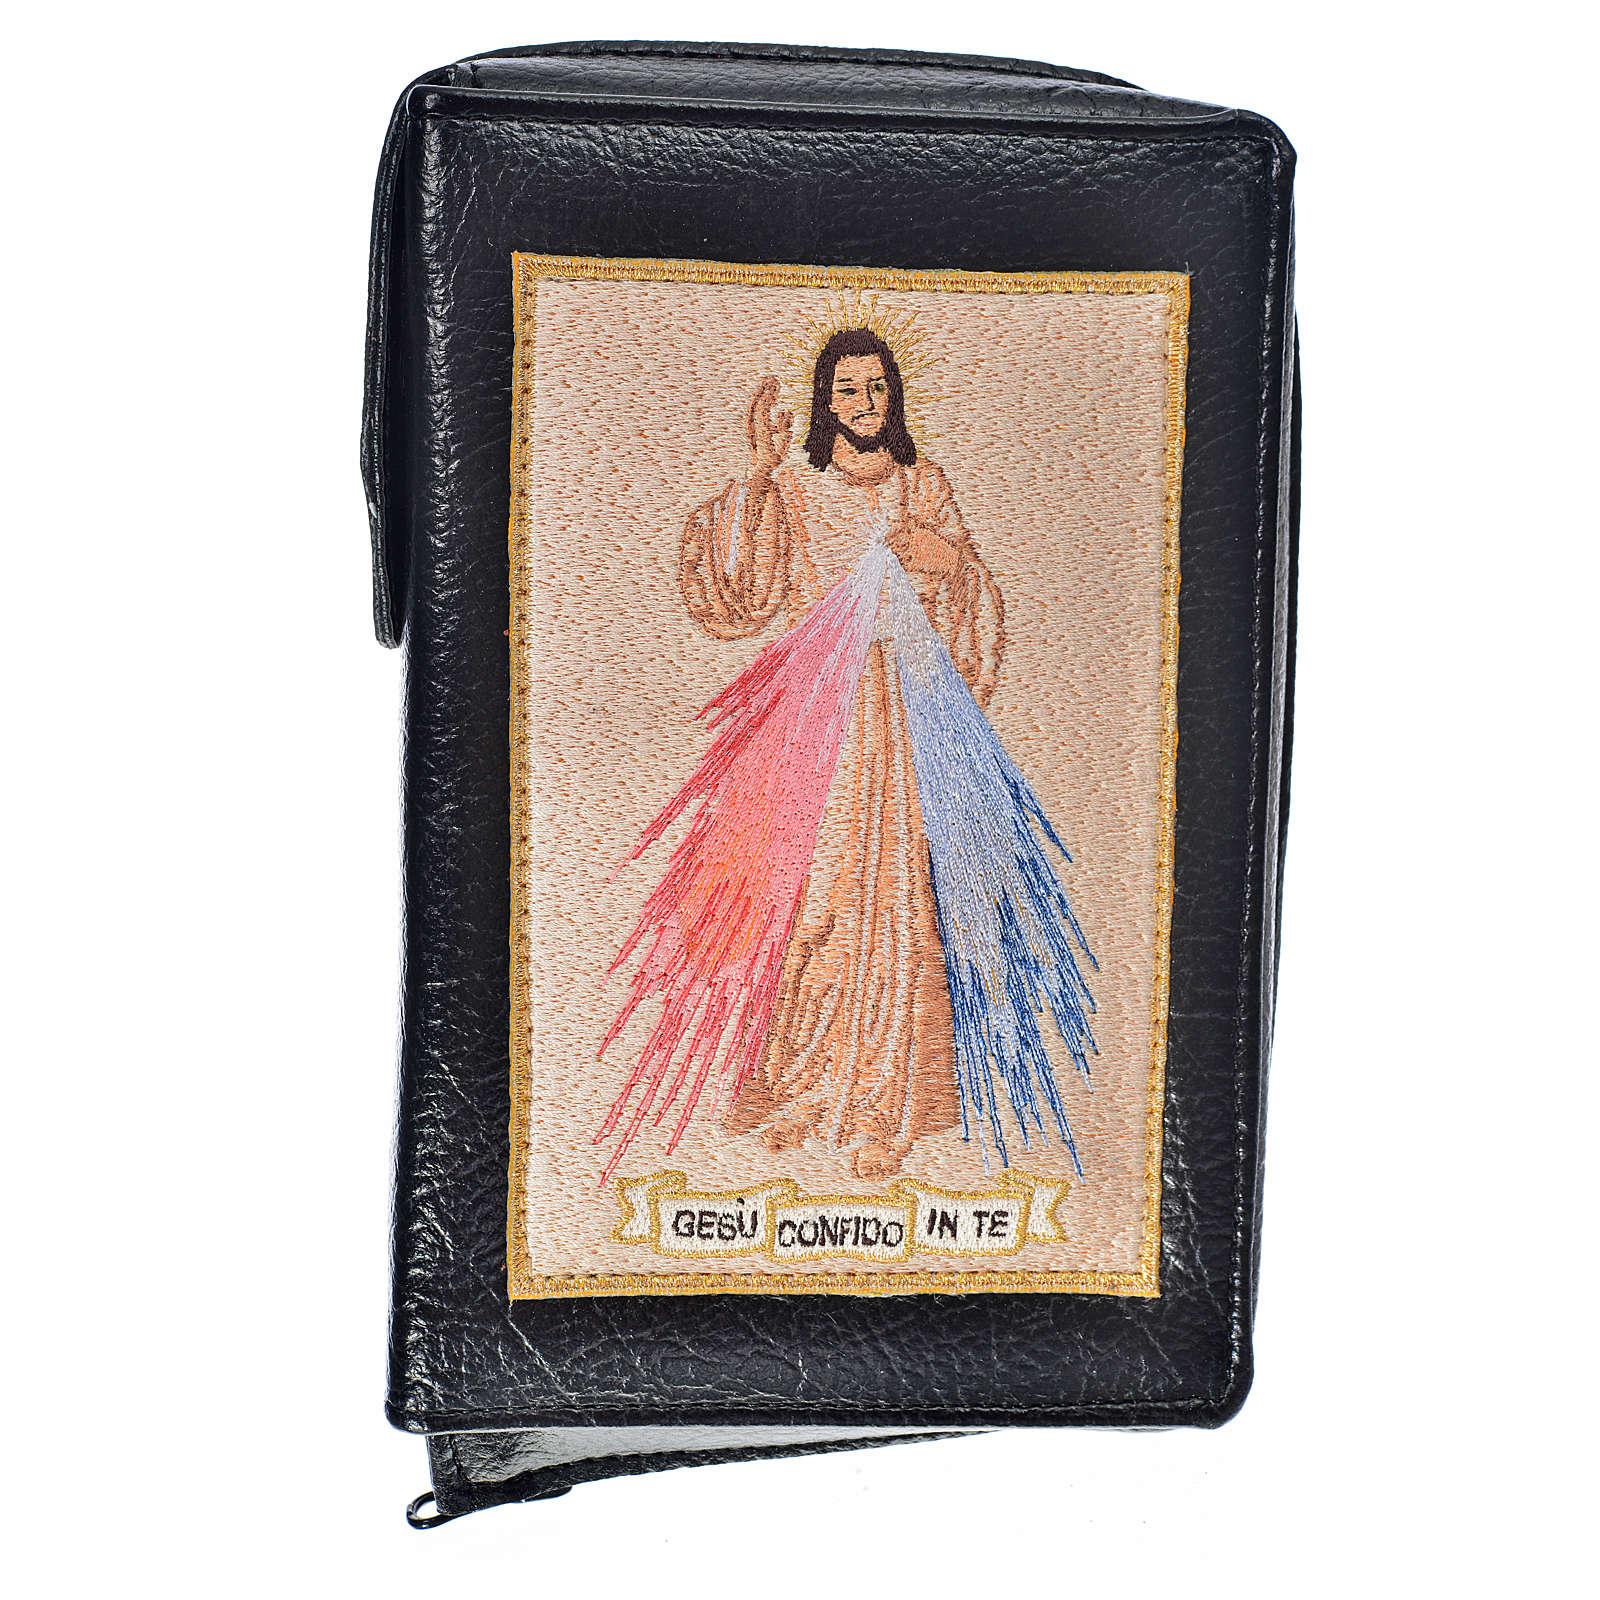 Funda Biblia Jerusalén Nueva Ed. negro simil cuero Divina Misericordia 4